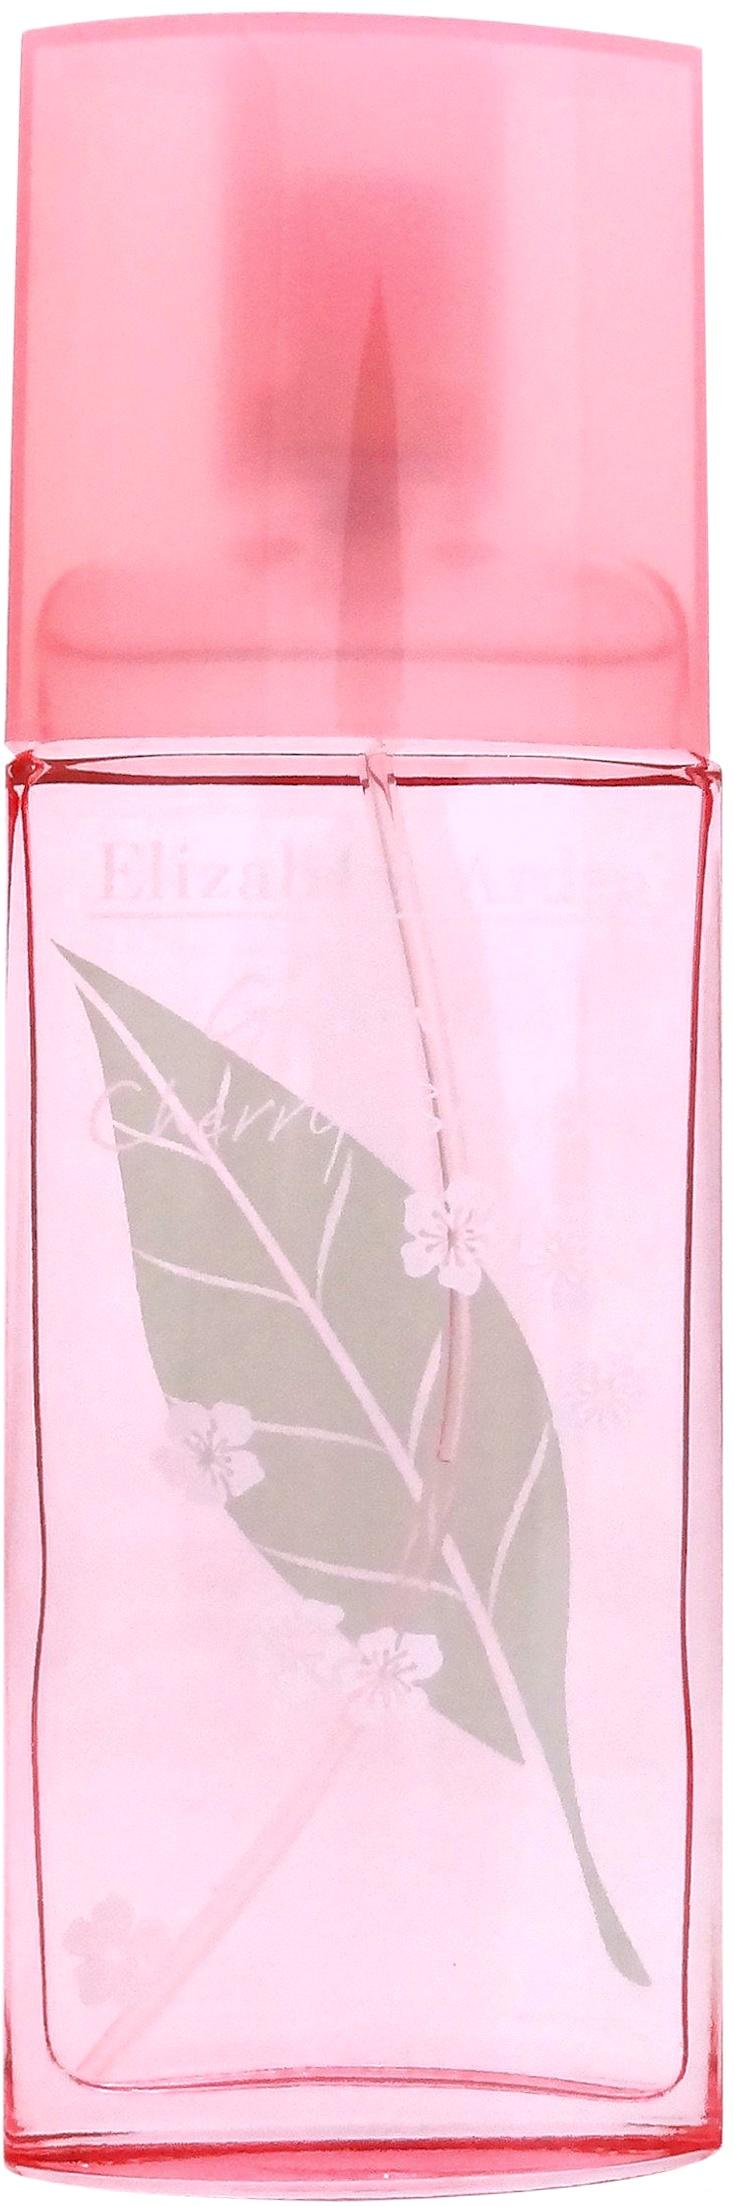 Elizabeth Arden Green Tea Cherry Blossom туалетная вода 100мл тестер (Элизабет Арден Зеленый Чай Цветение Сакуры)